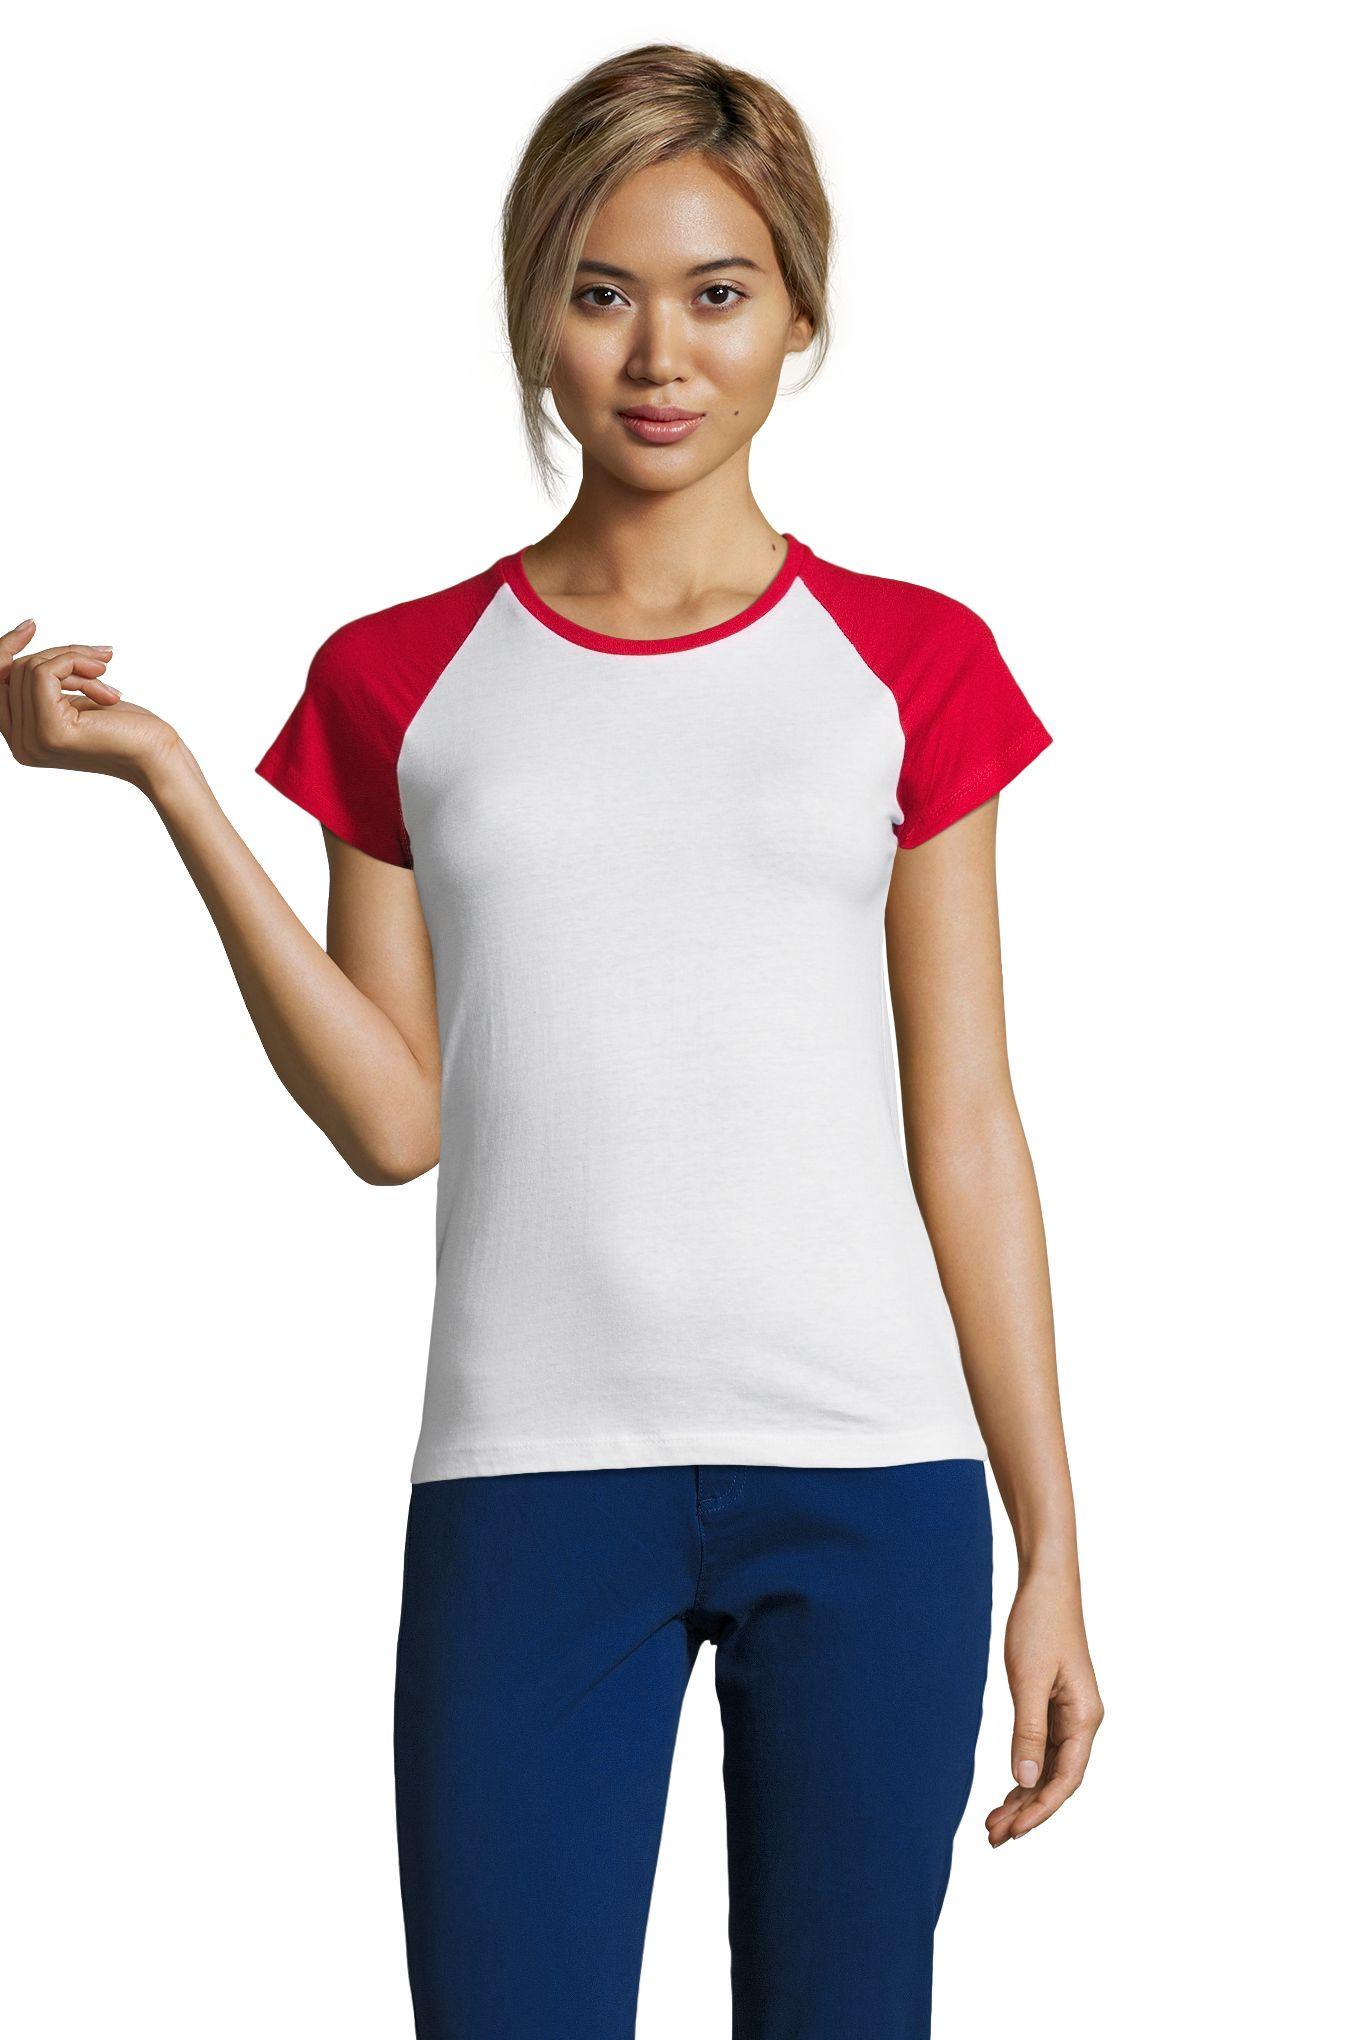 987 - White / Red